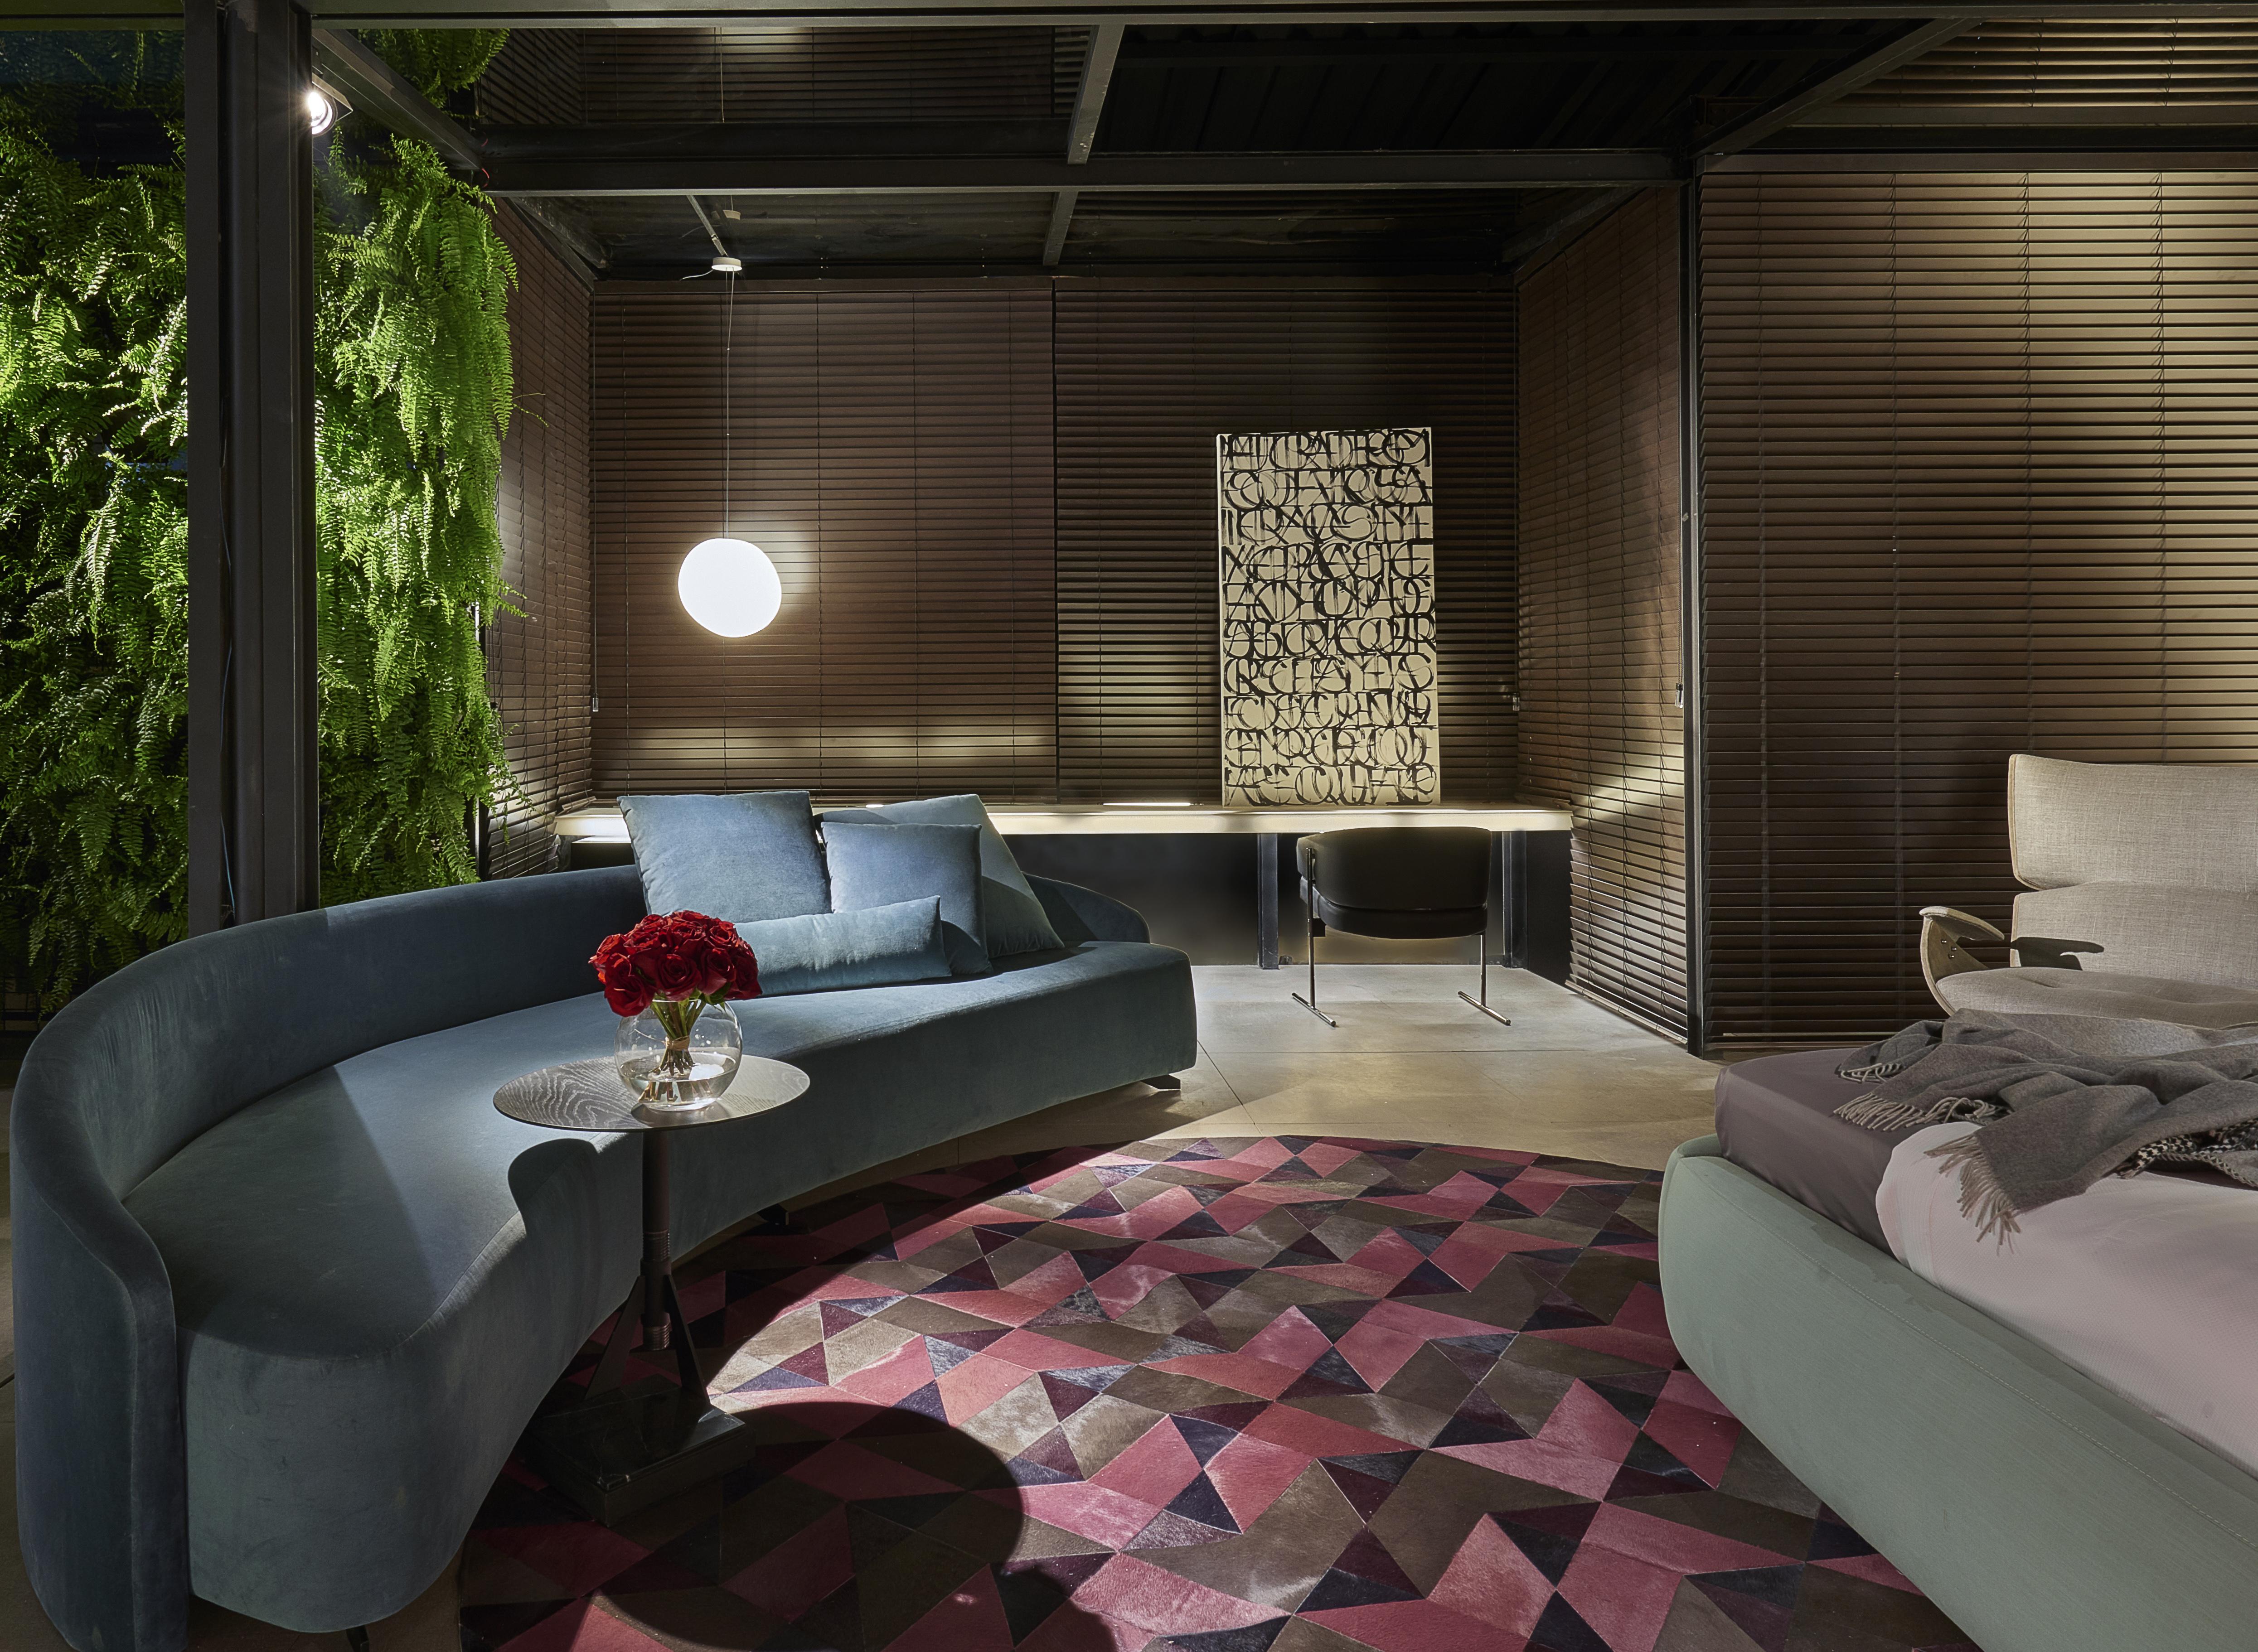 Quarto de hotel - Junior Piacesi - Decorar Exclusive - Jomar Bragança - Persiana de madeira 50 (1)